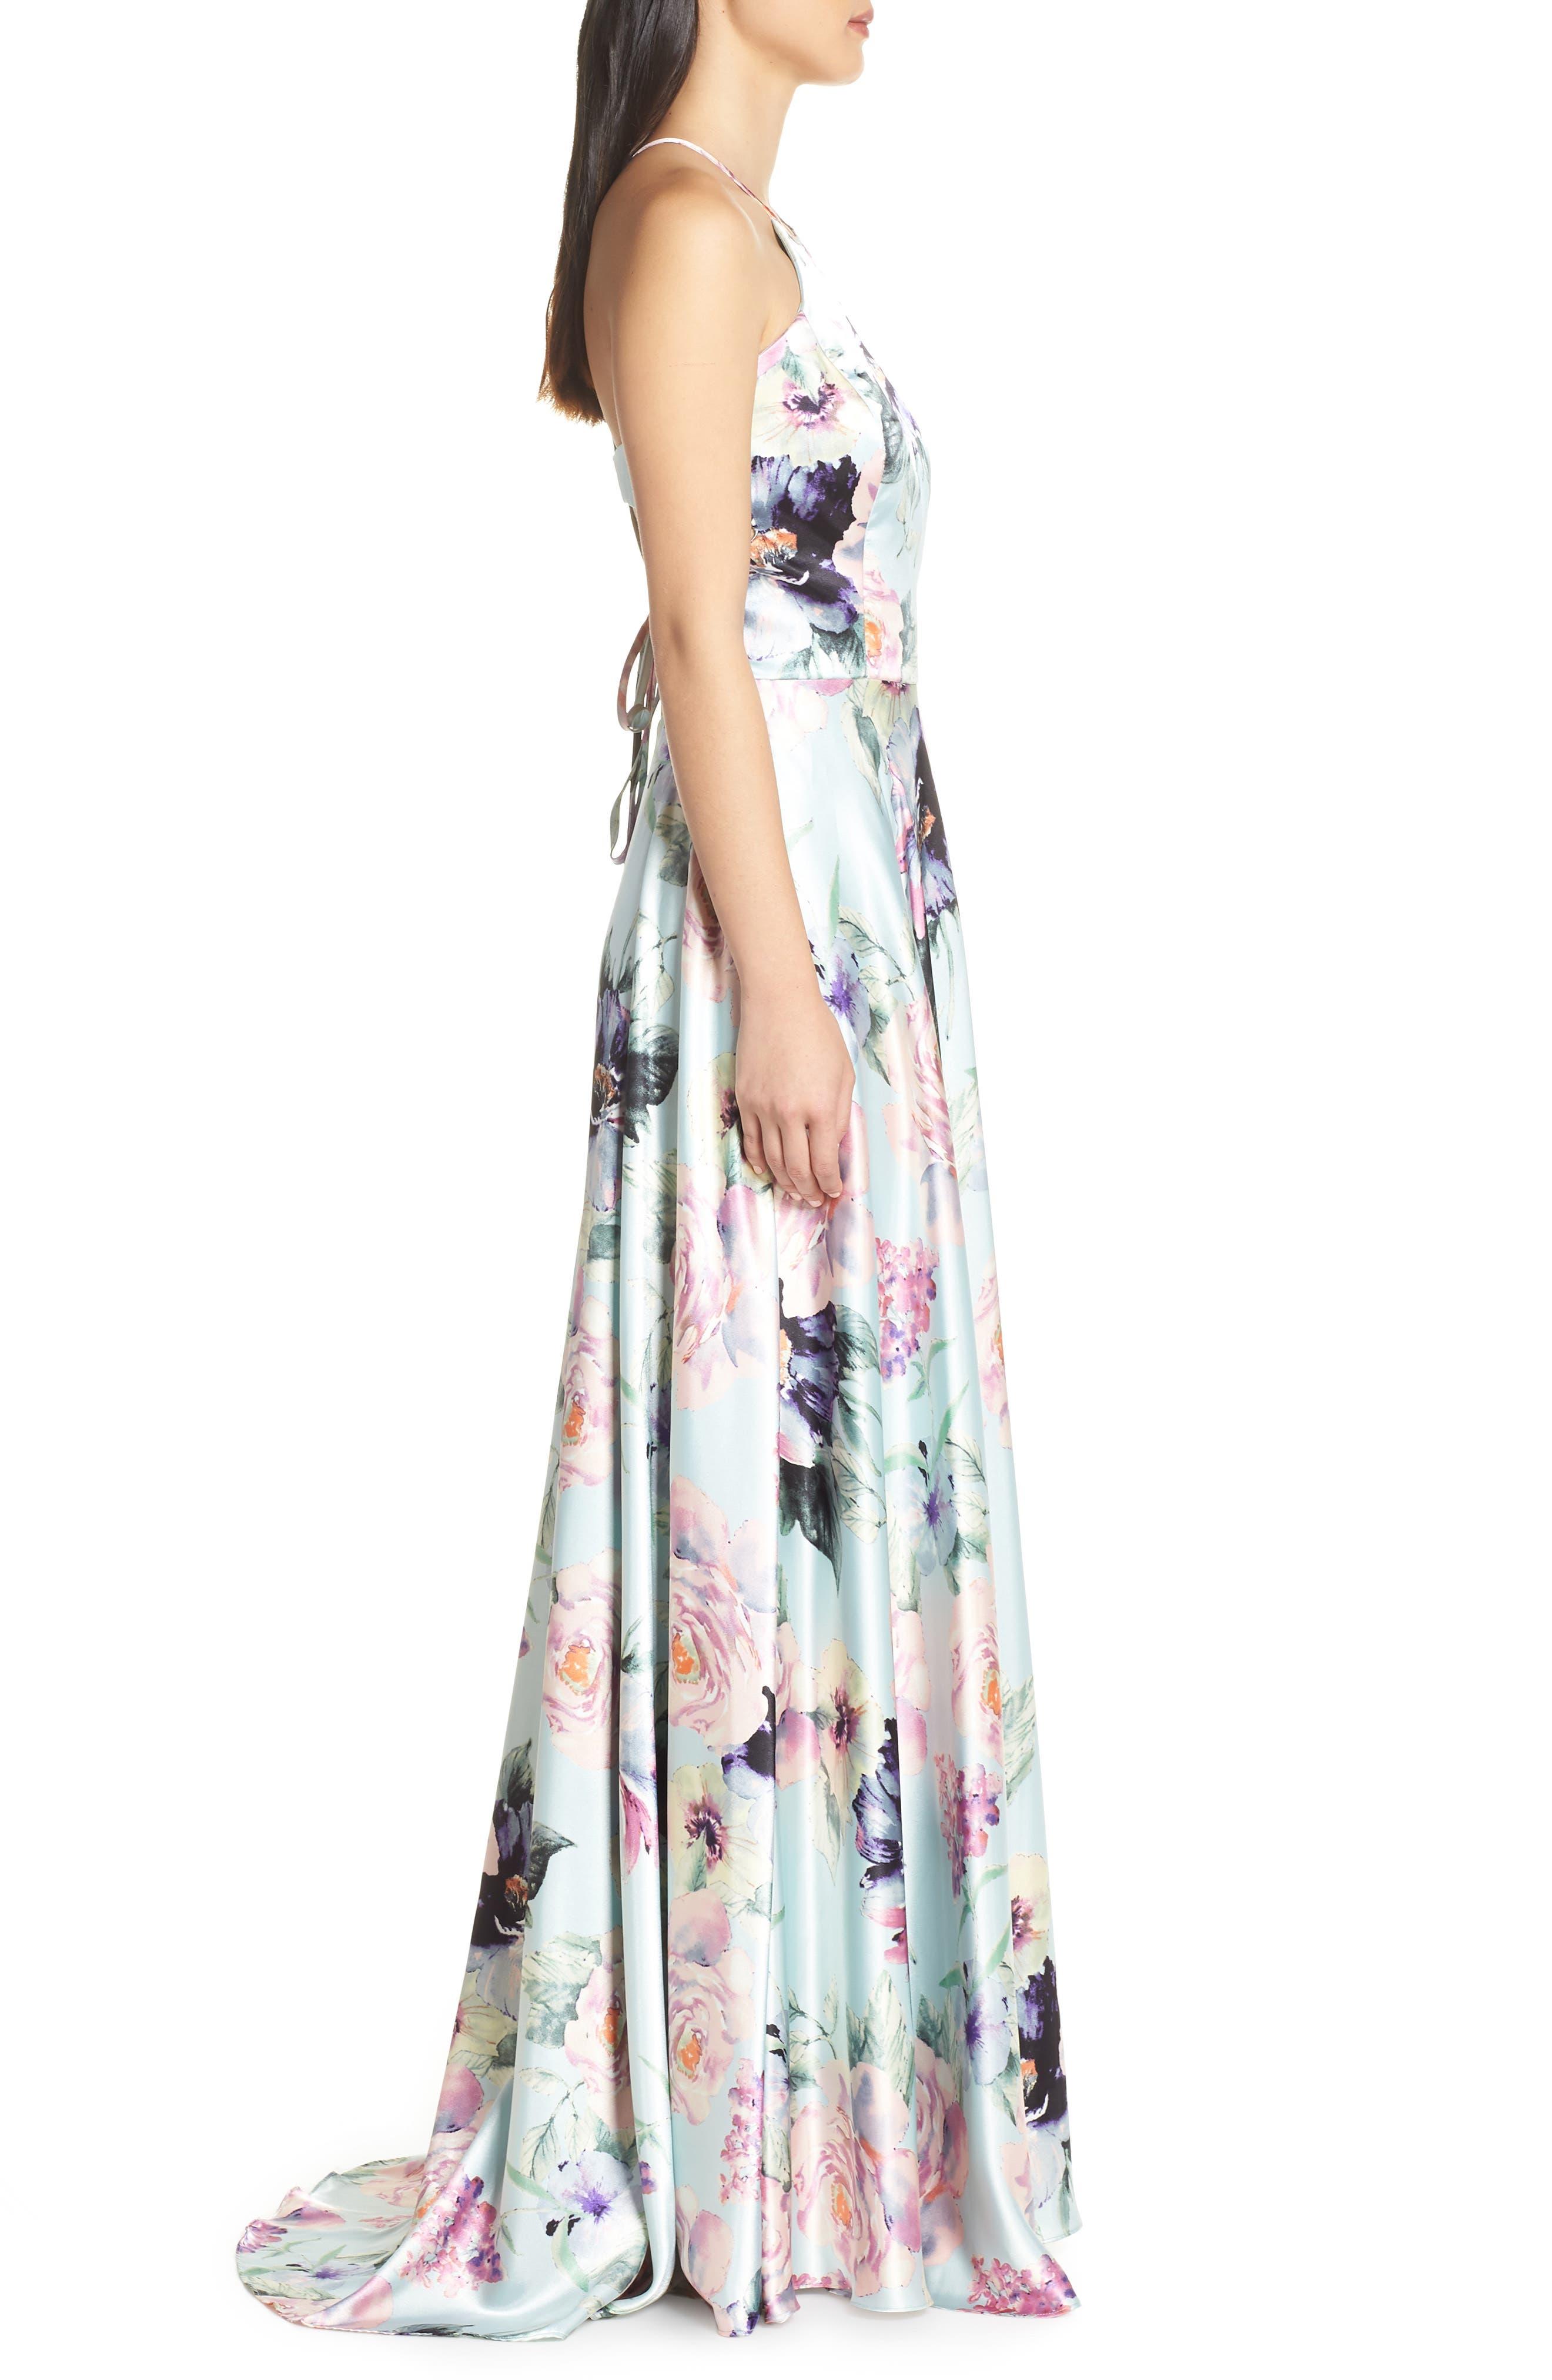 BLONDIE NITES,                             Floral Print Charmeuse Evening Dress,                             Alternate thumbnail 3, color,                             MINT/ MULTI